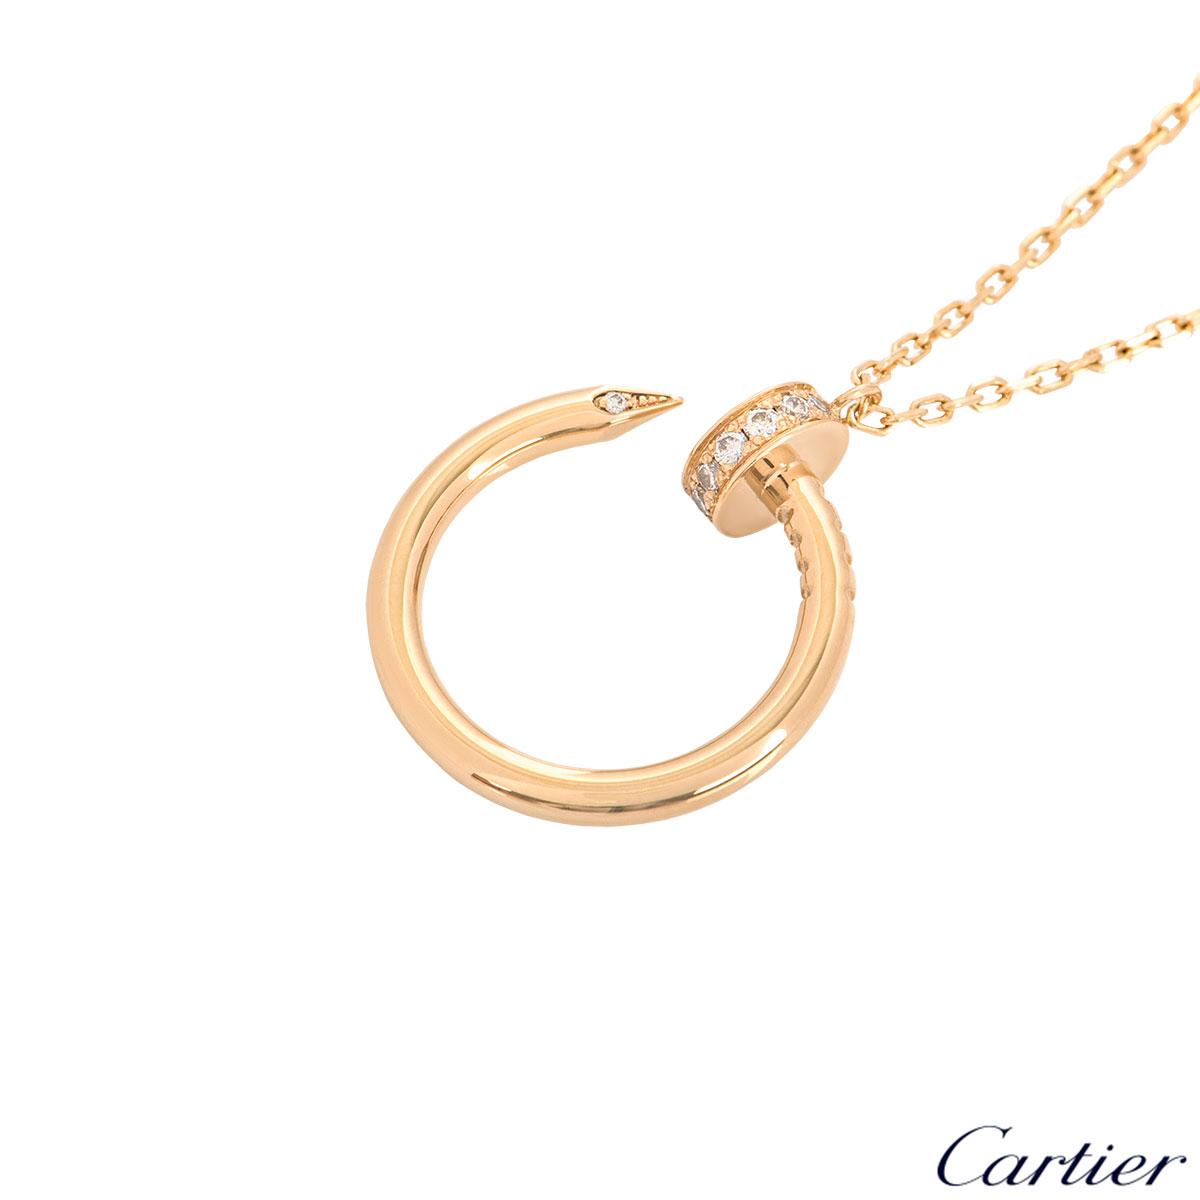 Cartier Yellow Gold Juste Un Clou Diamond Necklace B7224512